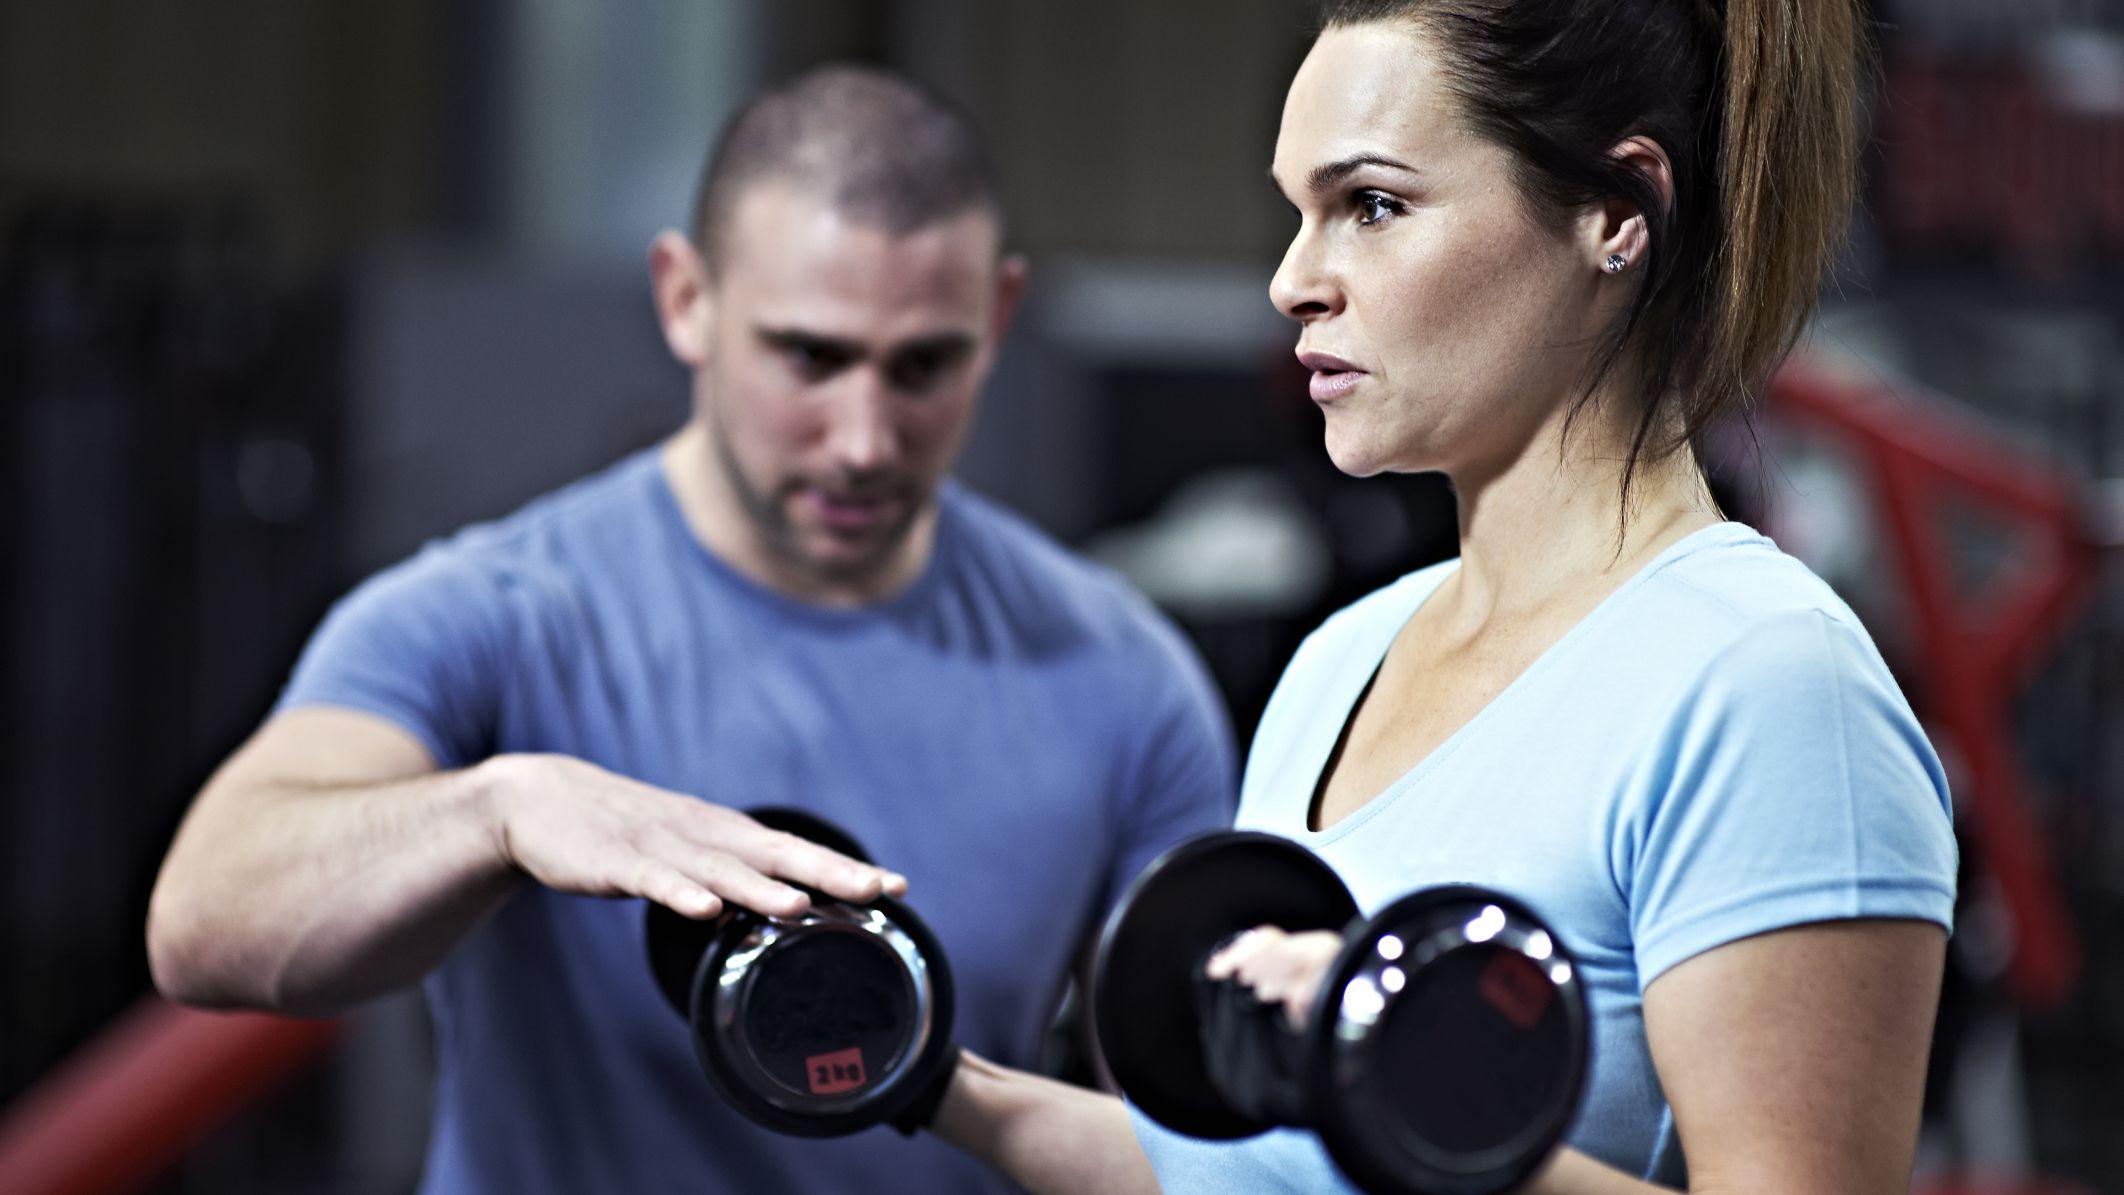 High-Intensity Intervals vs Endurance Training